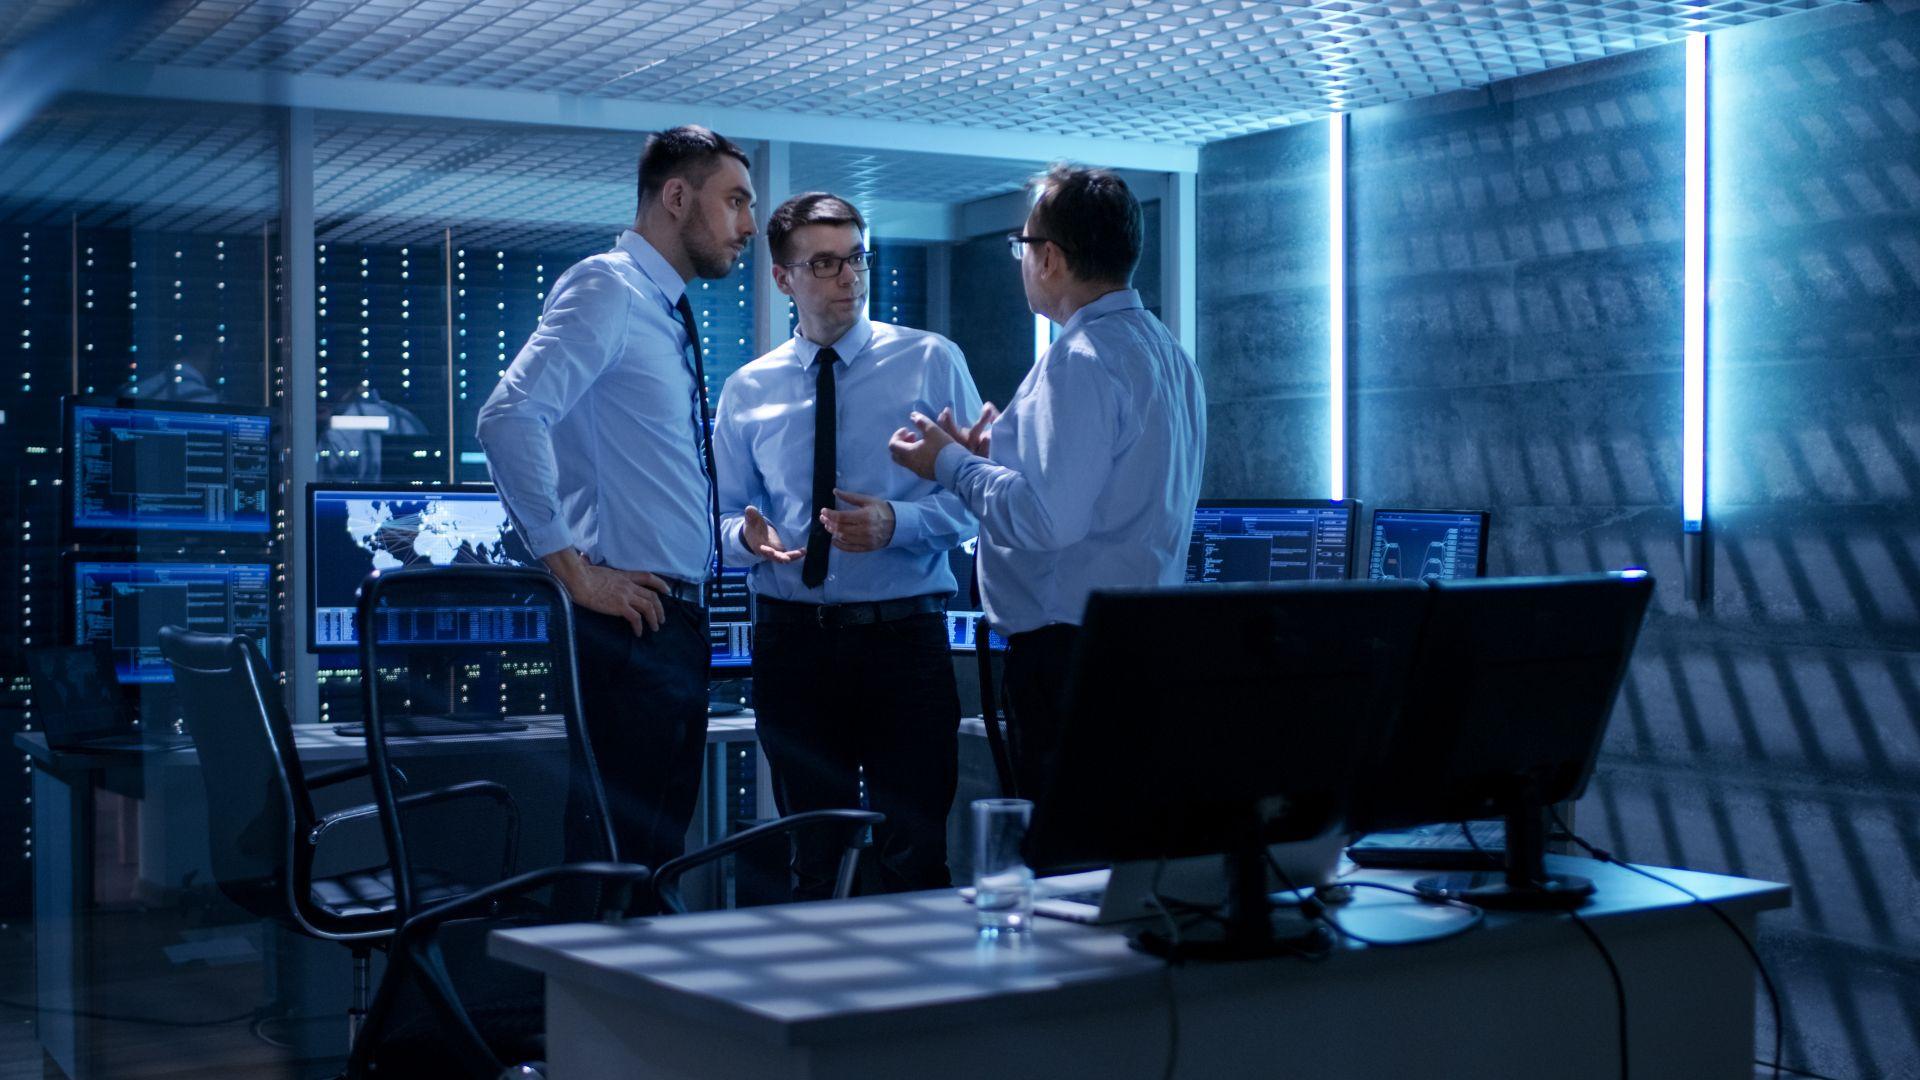 IT Consulting Services in Dubai